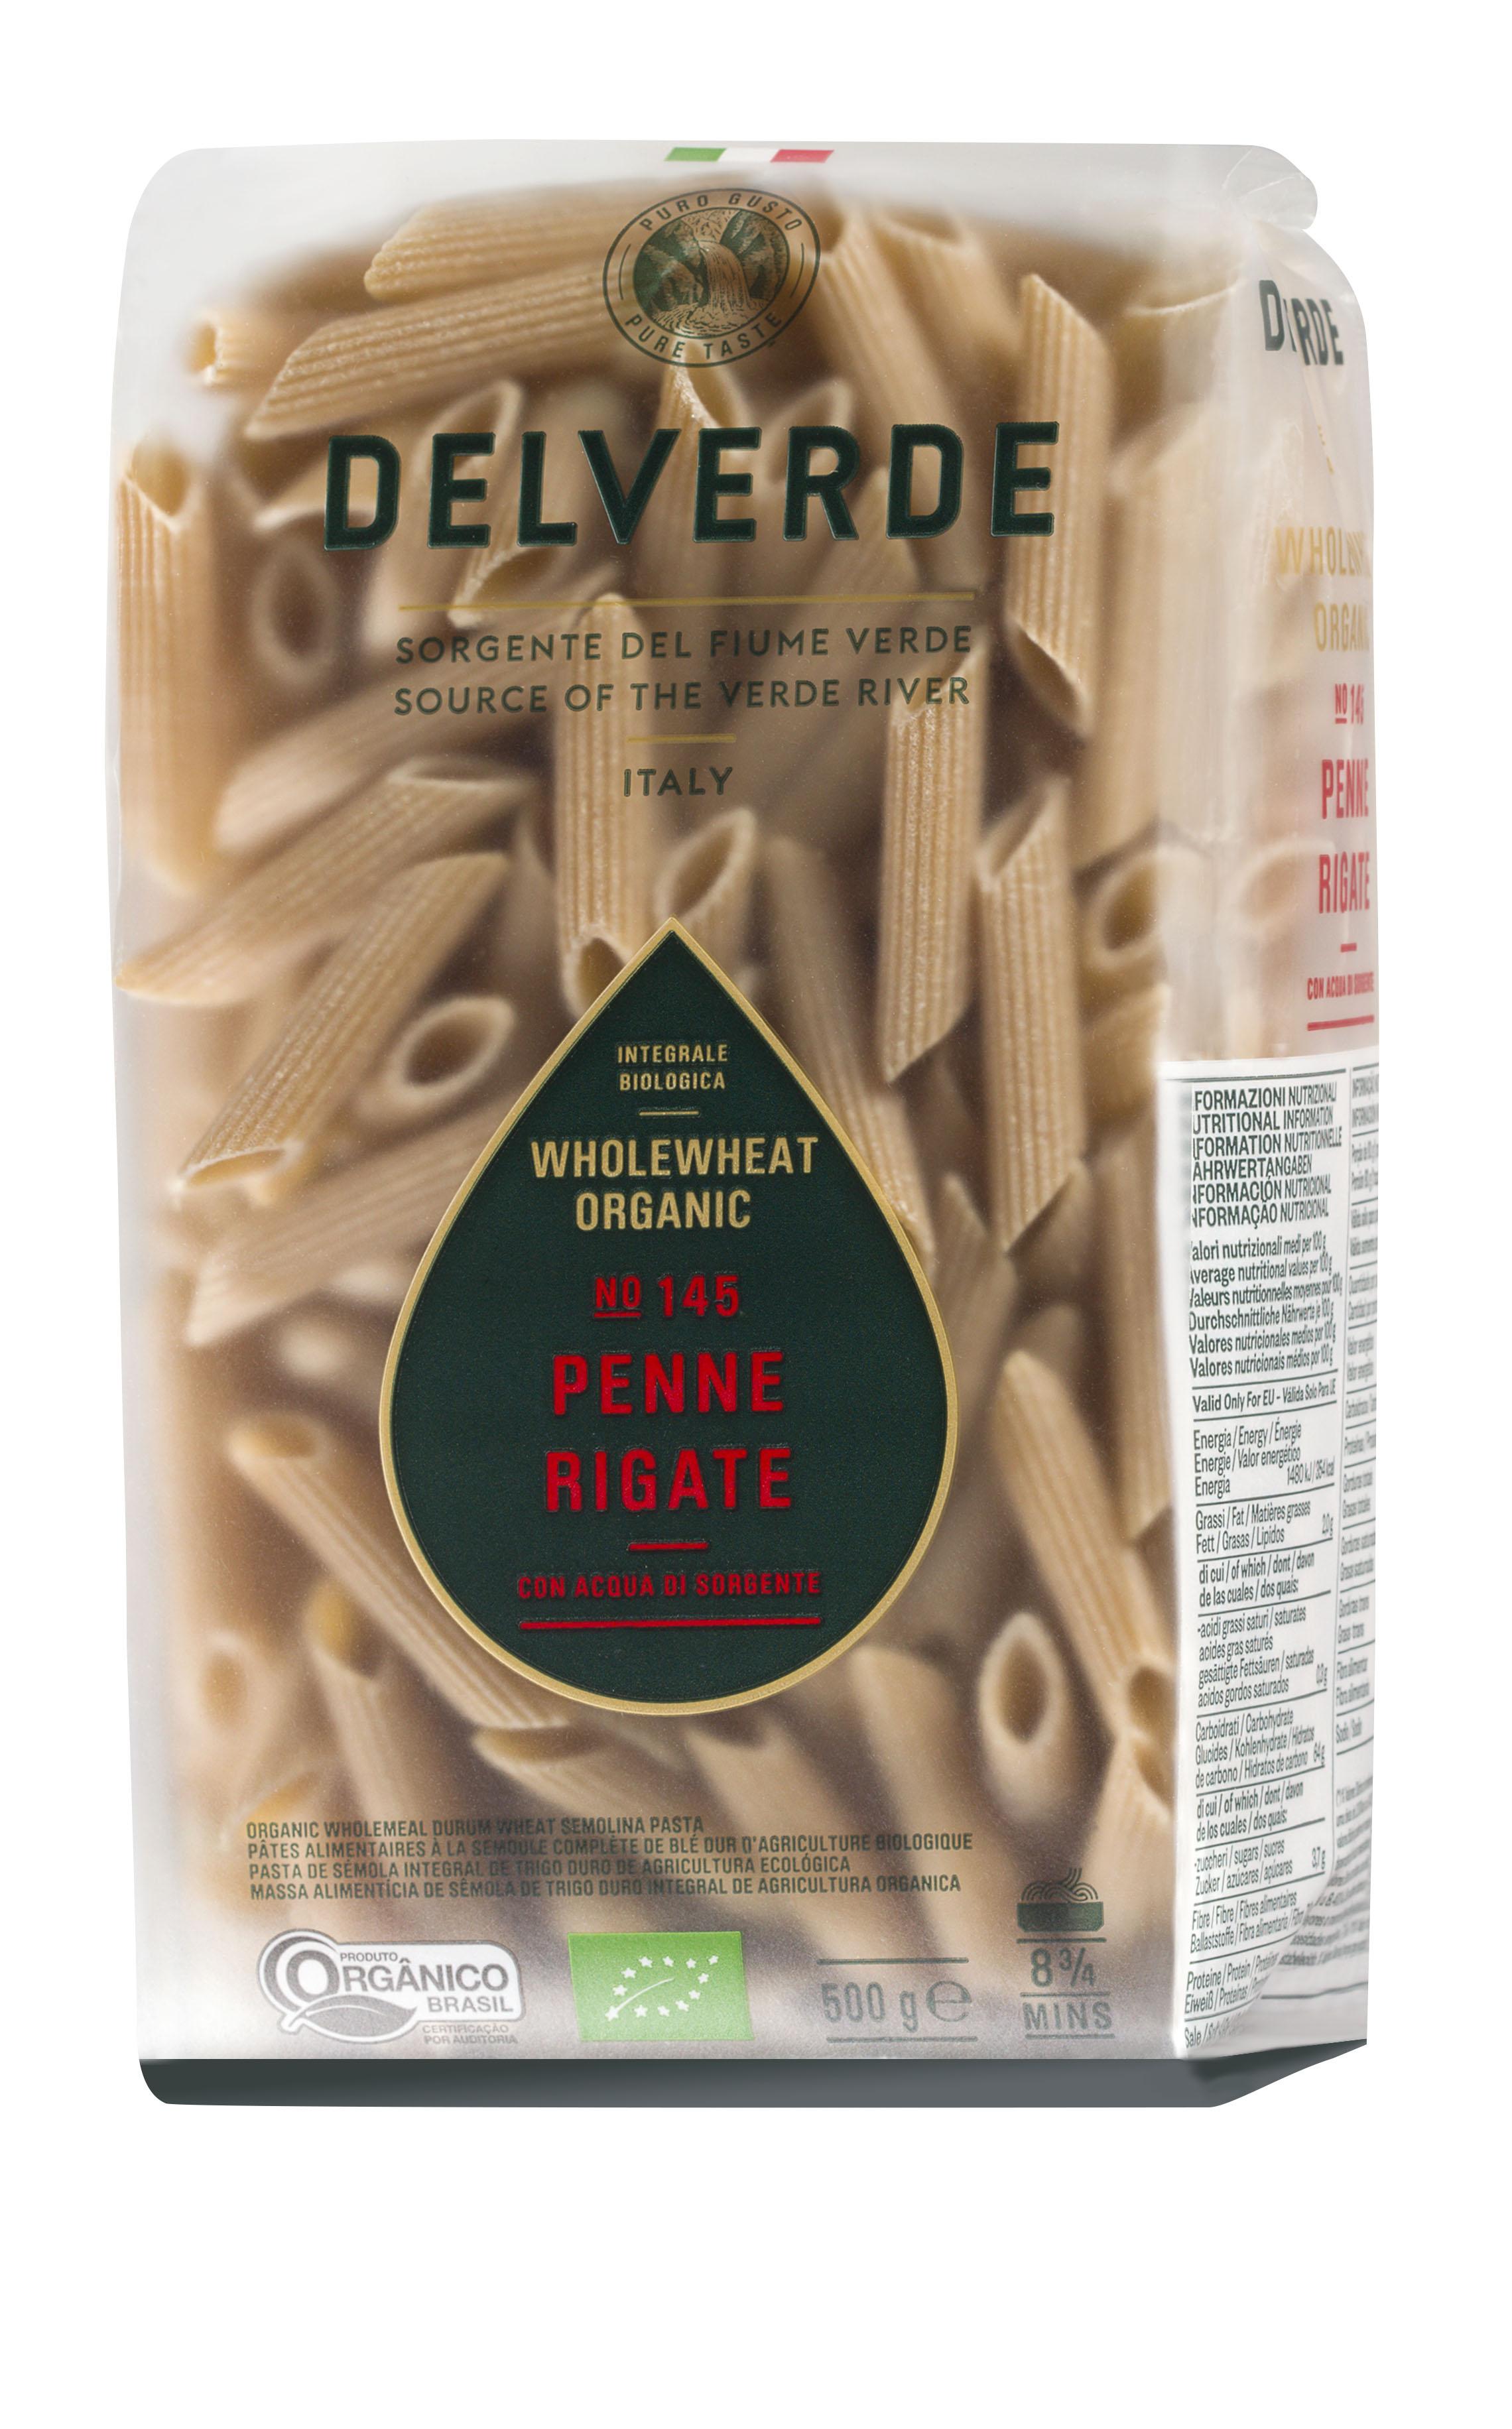 Делверде Макароны №145 Пенне Ригате Биолоджика с отрубями Delverde макароны delverde spaghetti 141 с отрубями био 500 г